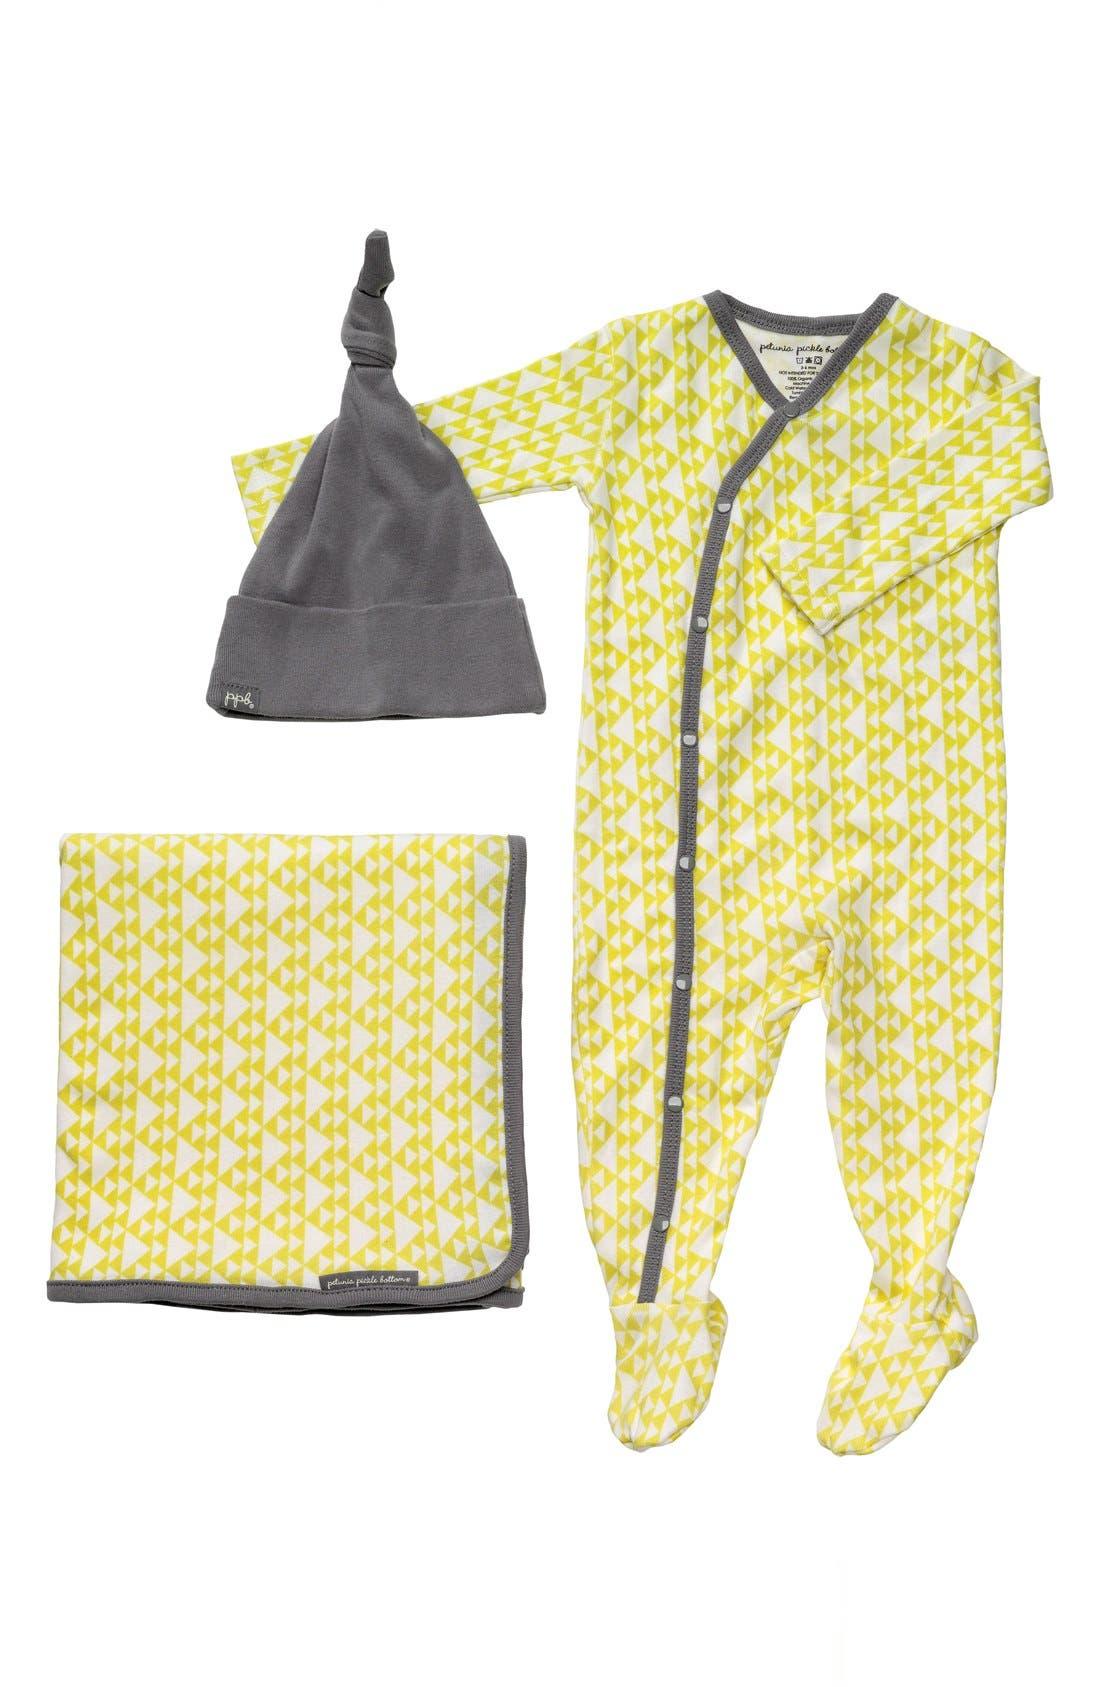 Main Image - Petunia Pickle Bottom 'Snuggle' Footie, Blanket & Hat Set (Infant)